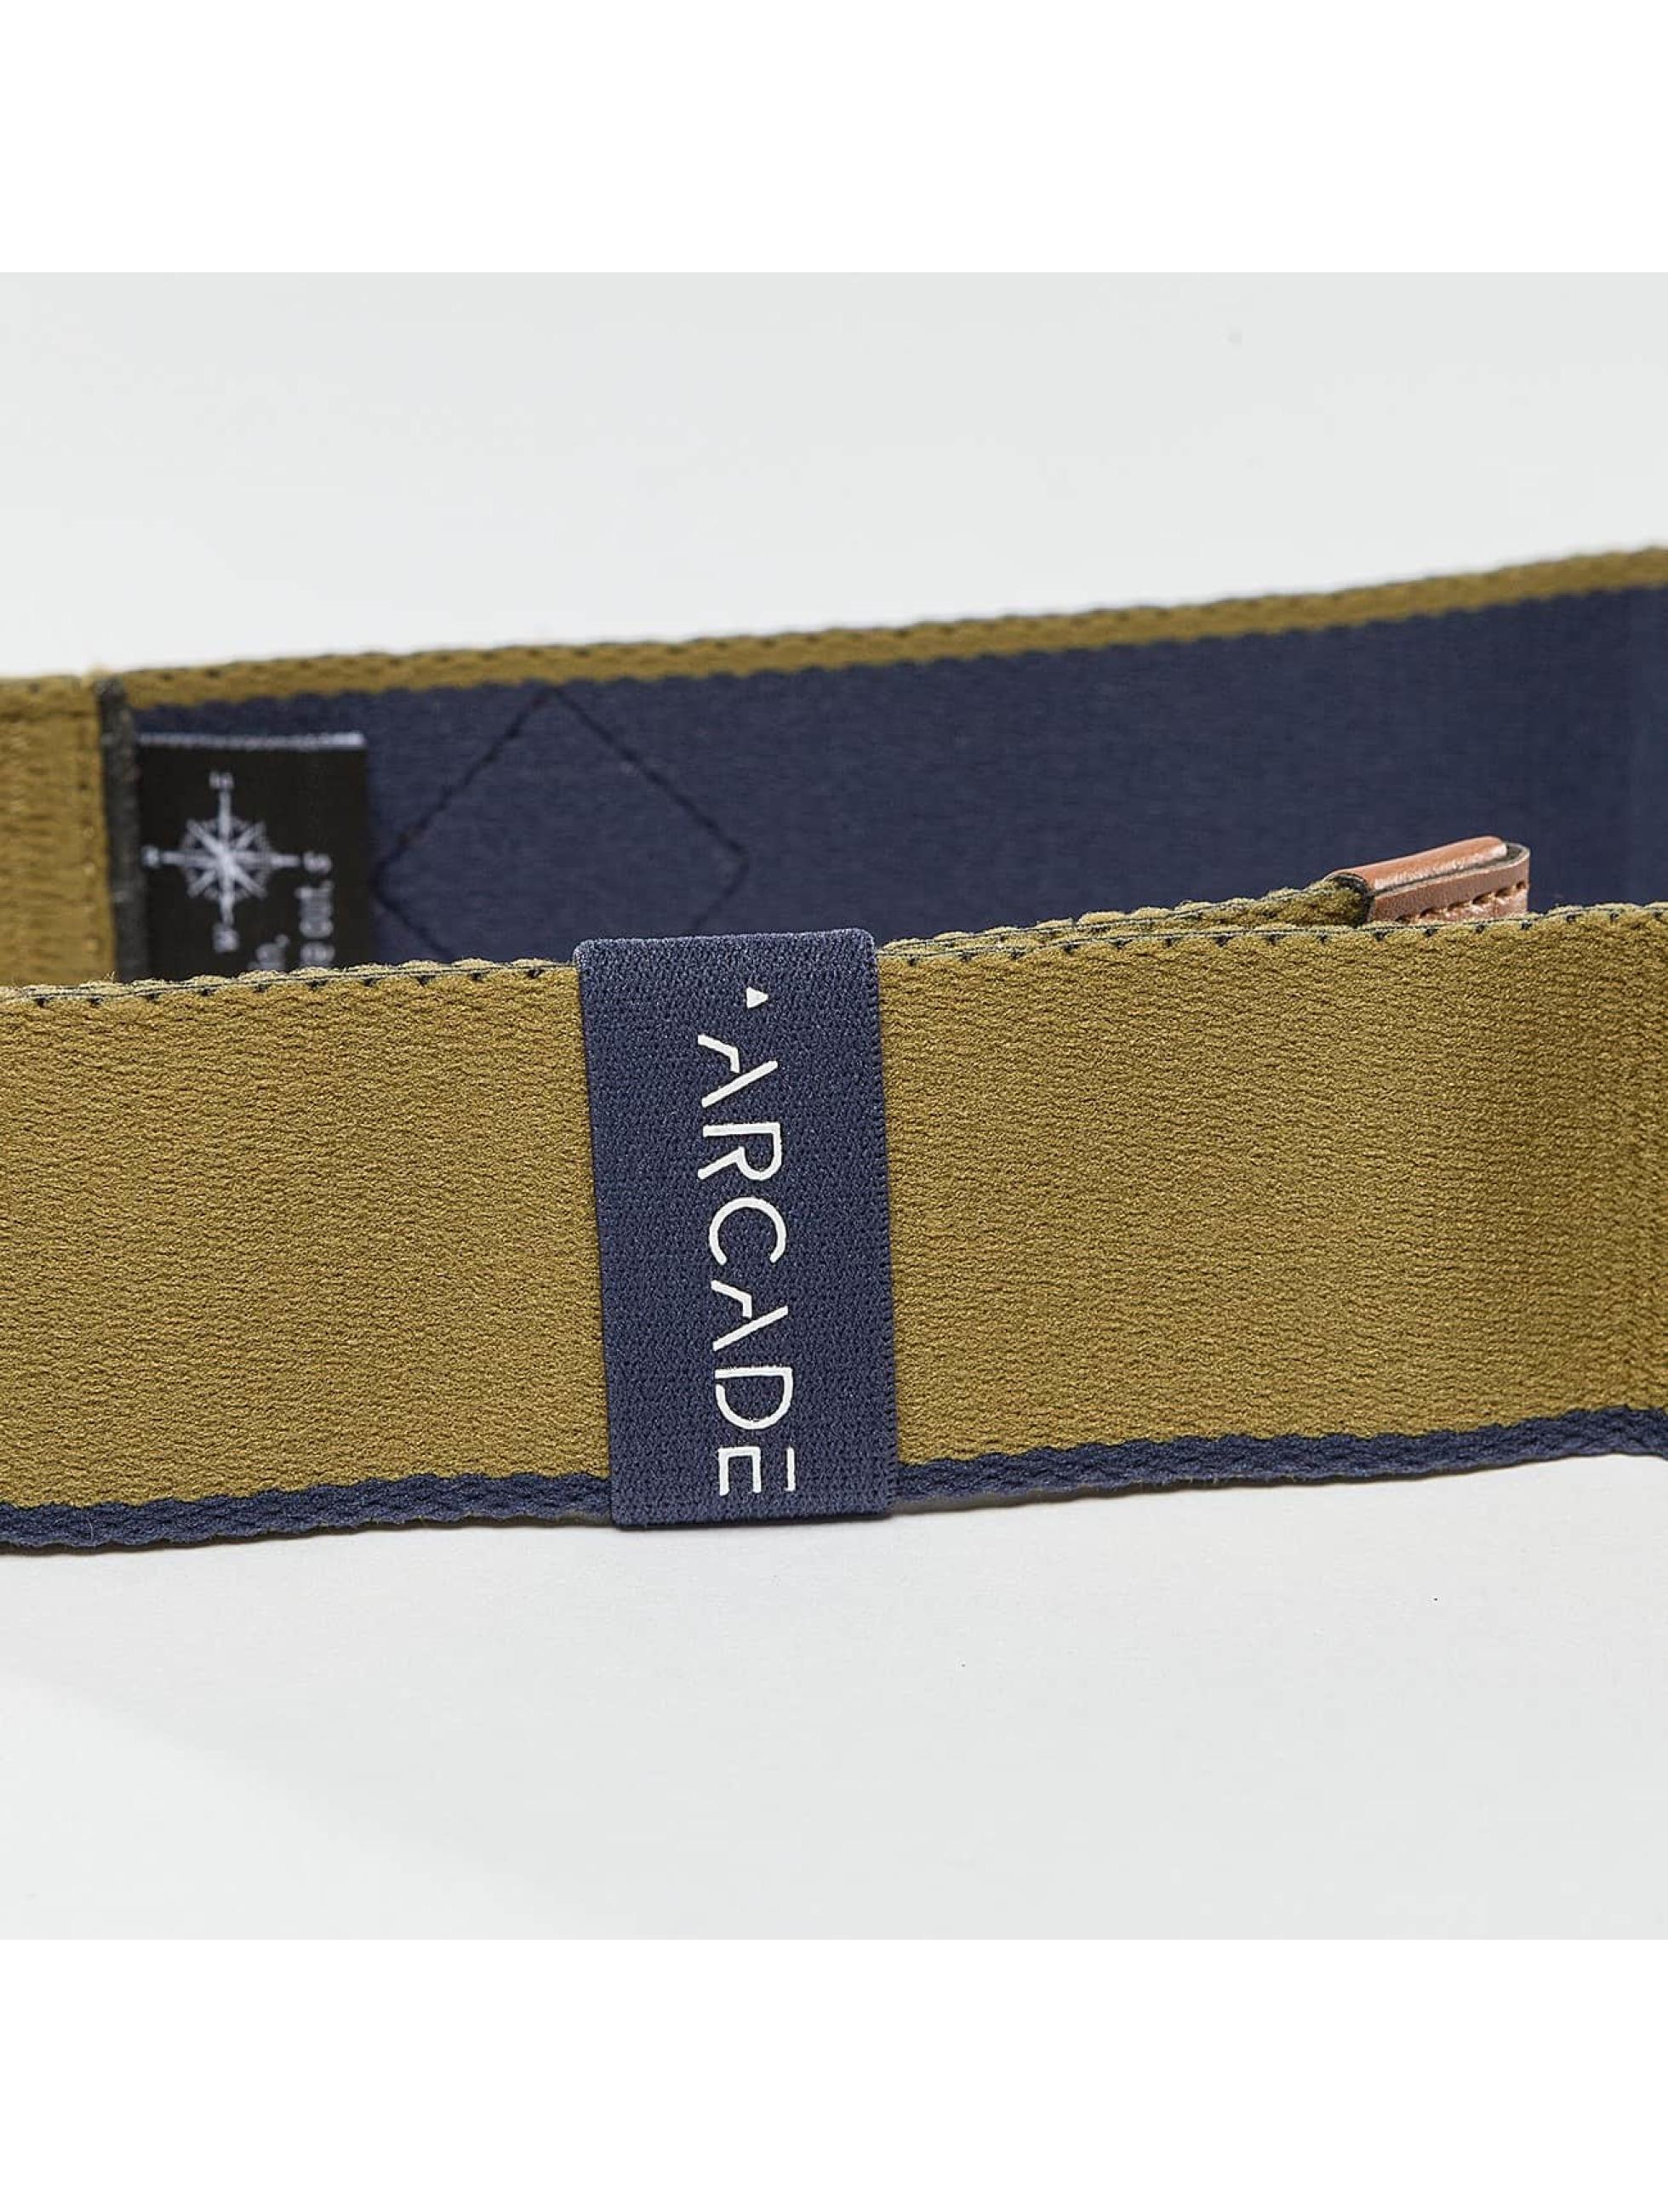 ARCADE Belts The Treeline khaki